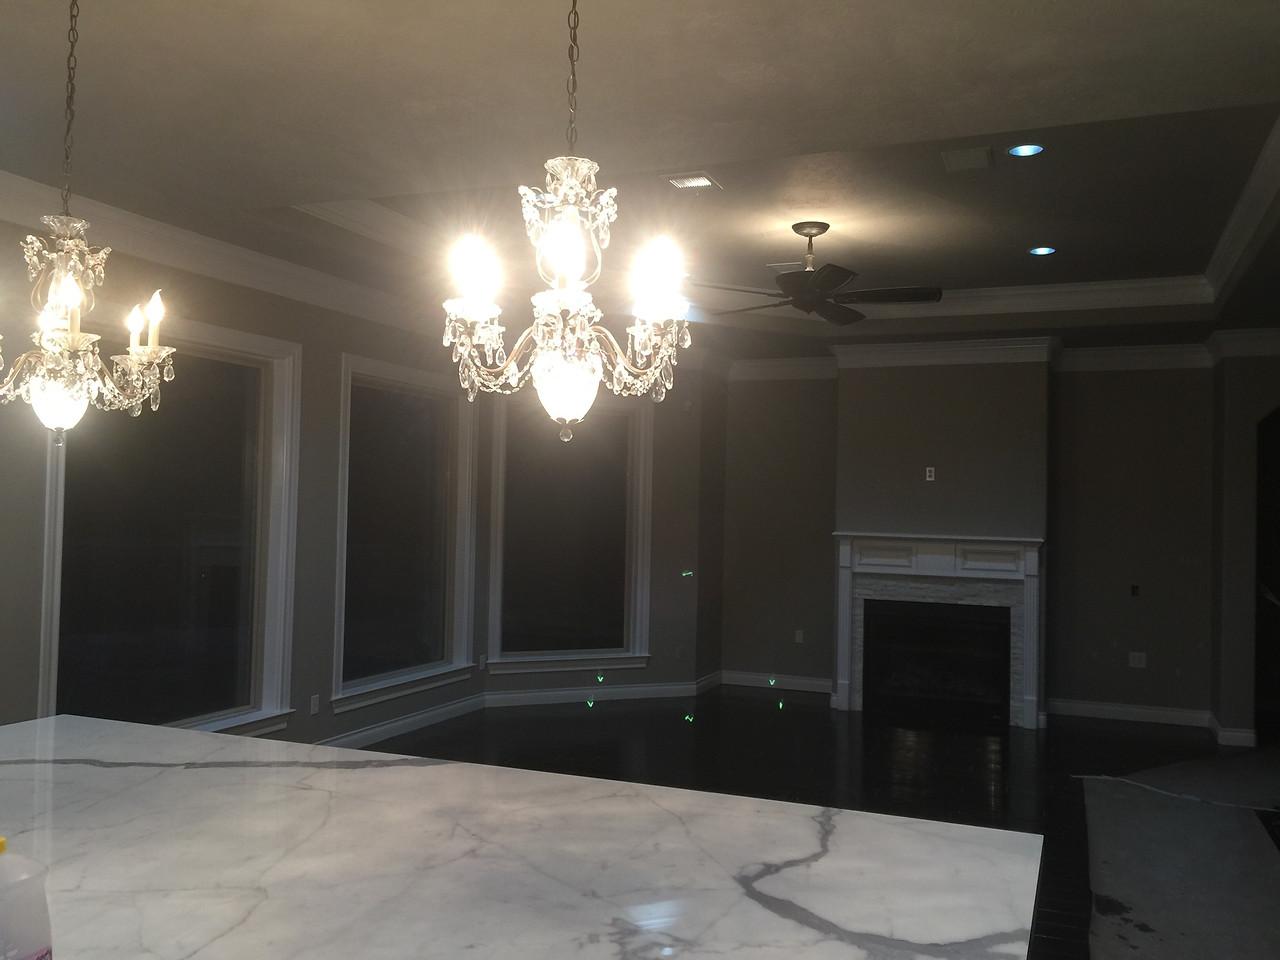 overhanging chandeliers in the kitchen